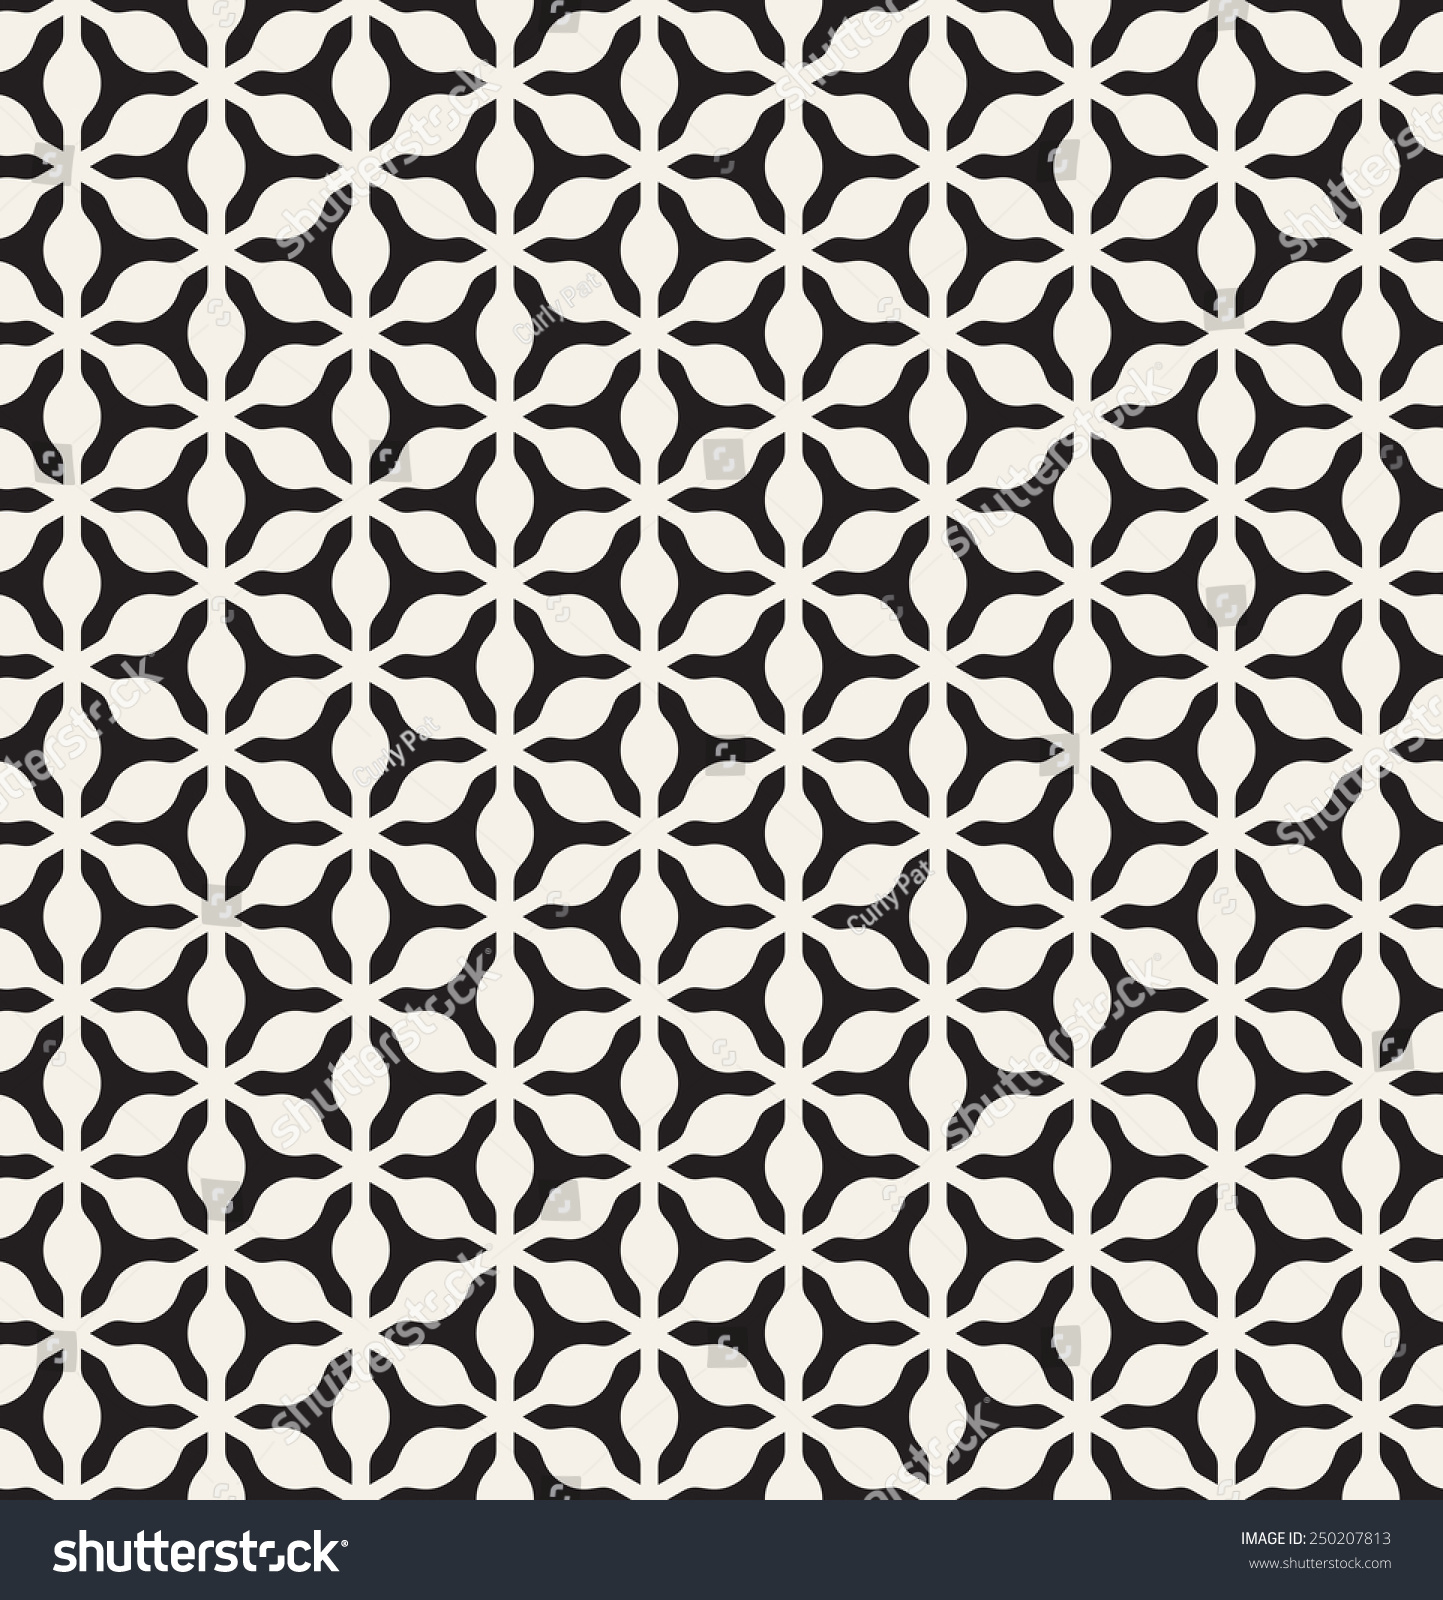 seamless geometric pattern geometric simple print stock vector rh shutterstock com geometric pattern vector background geometric pattern vector download